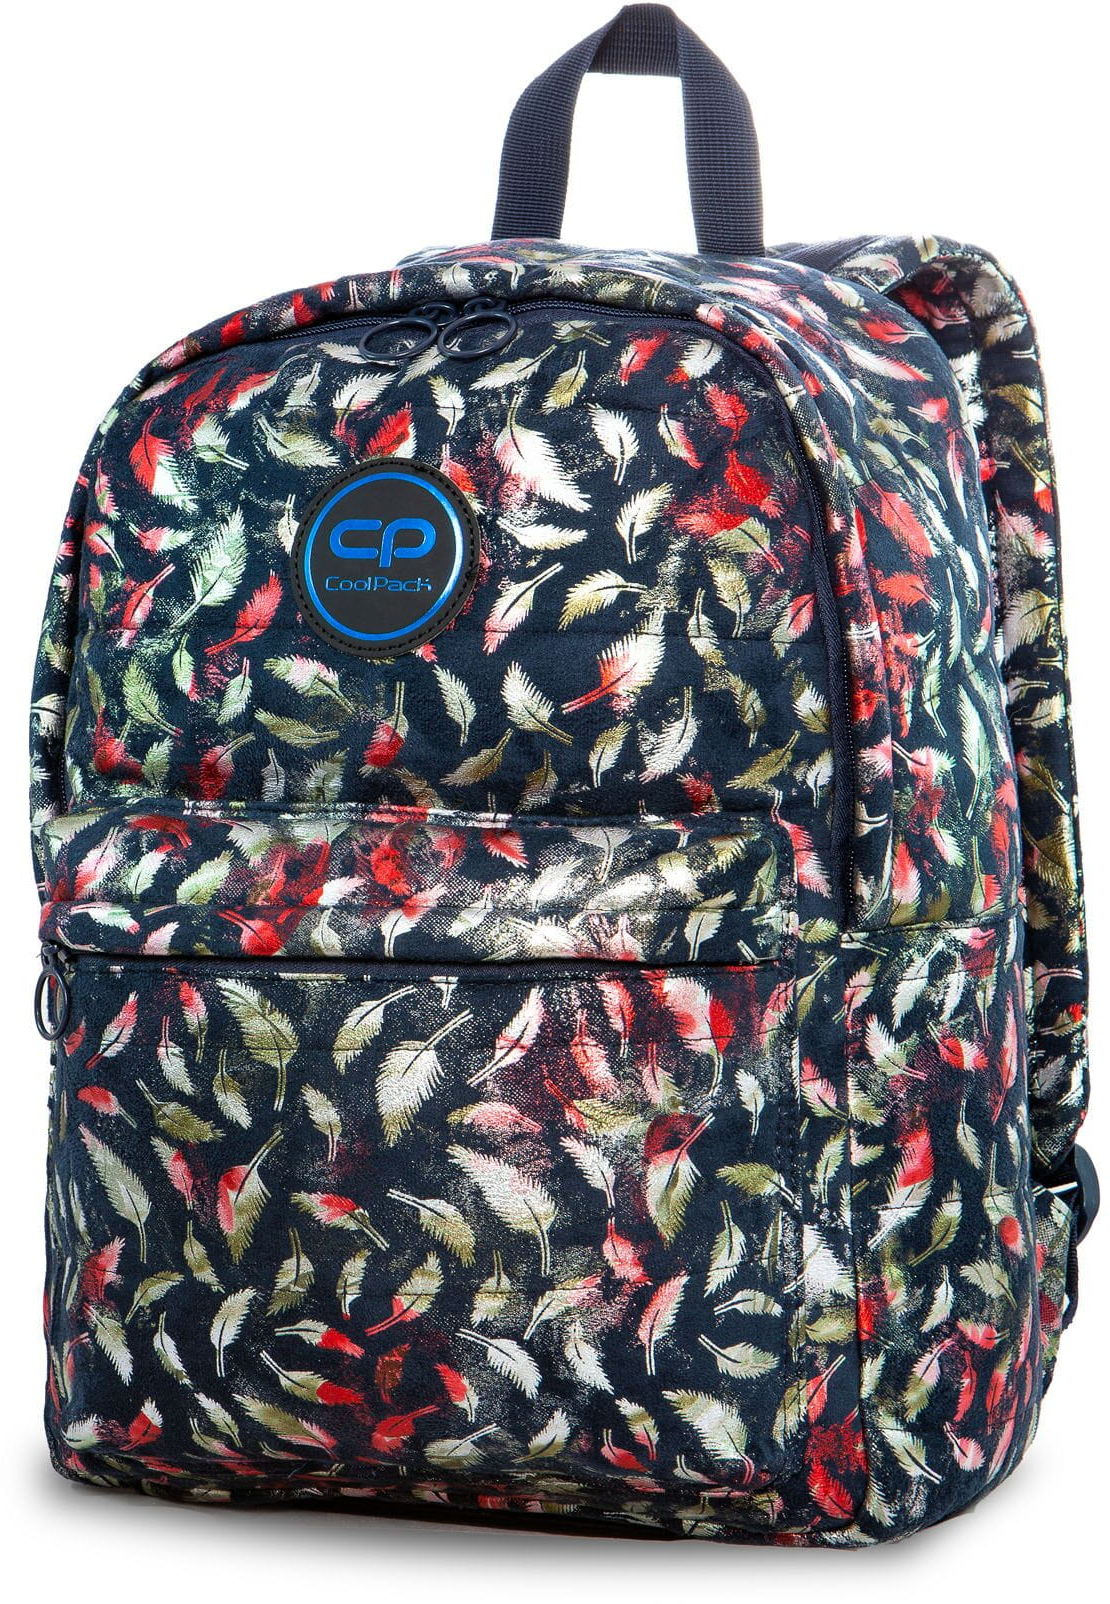 Plecak Coolpack RUBY PIÓRA